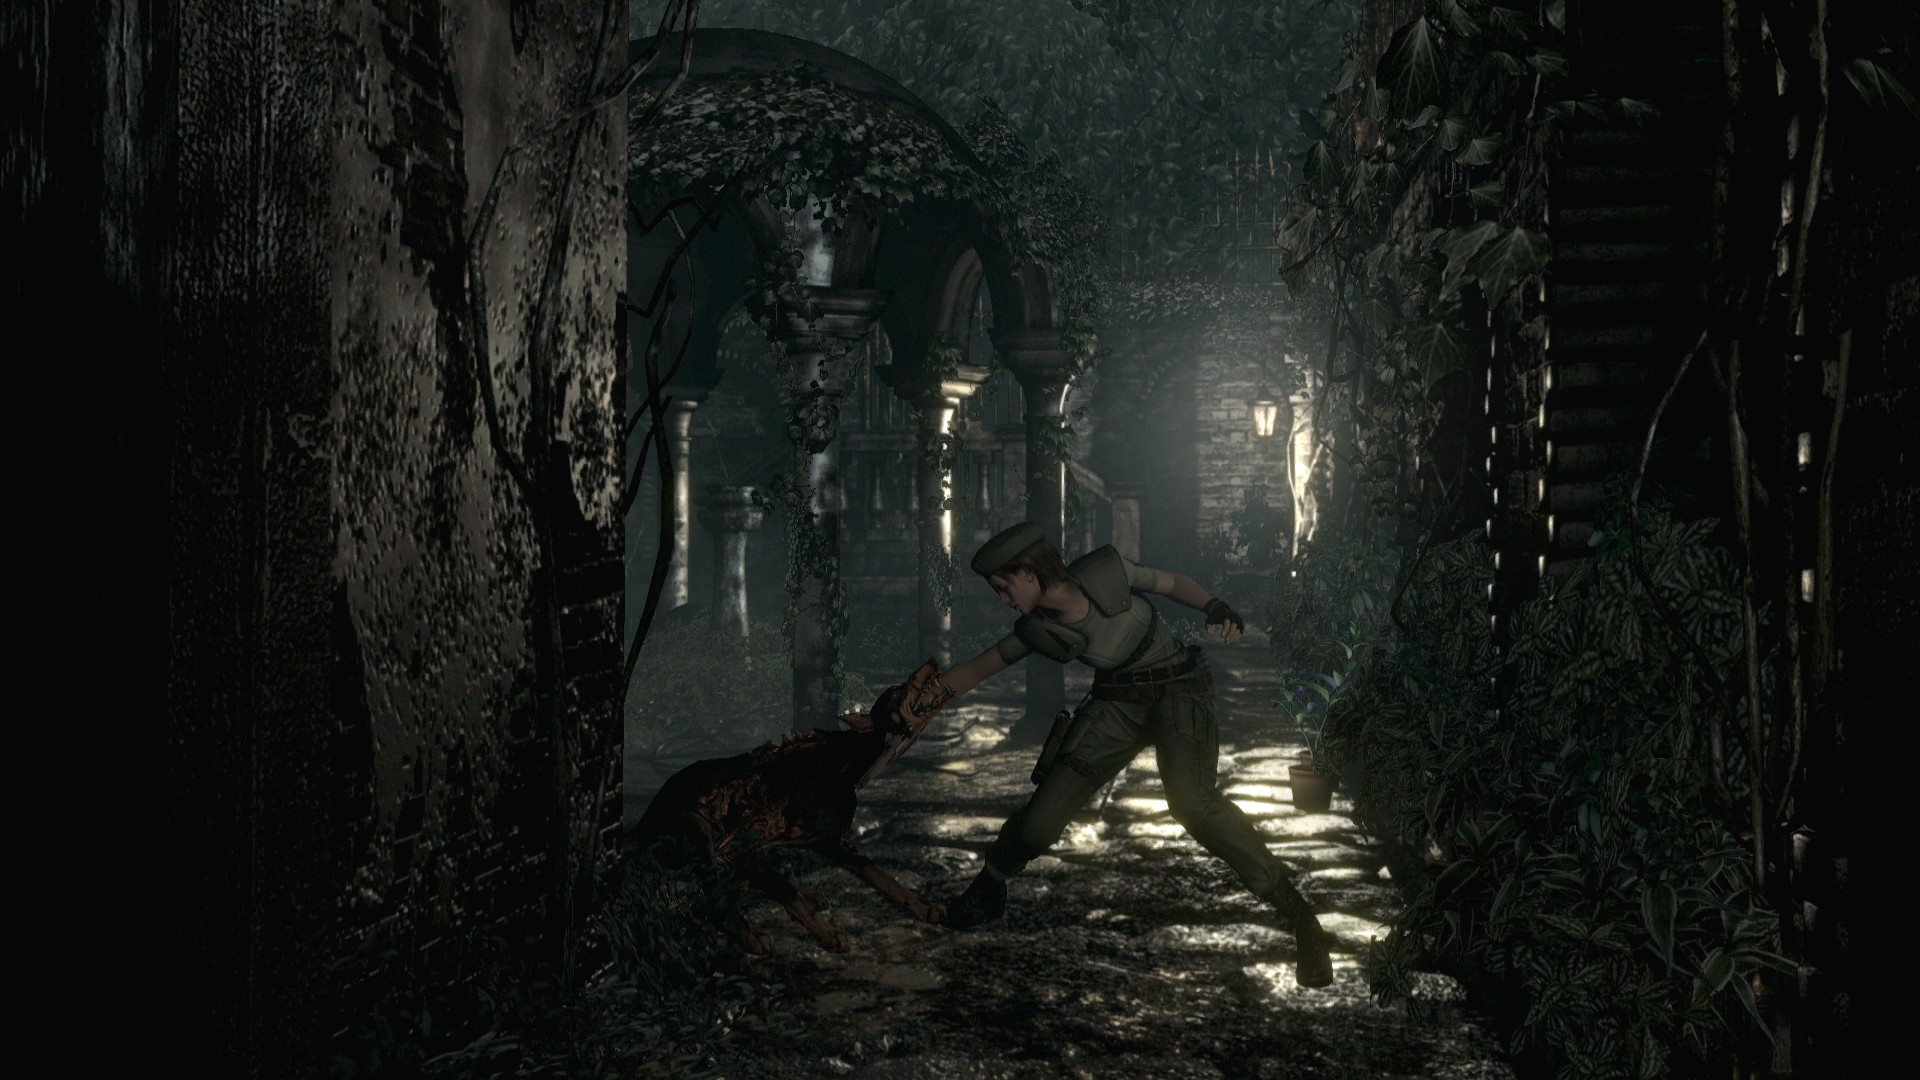 Image result for Resident Evil 7 Biohazard screenshot 1080